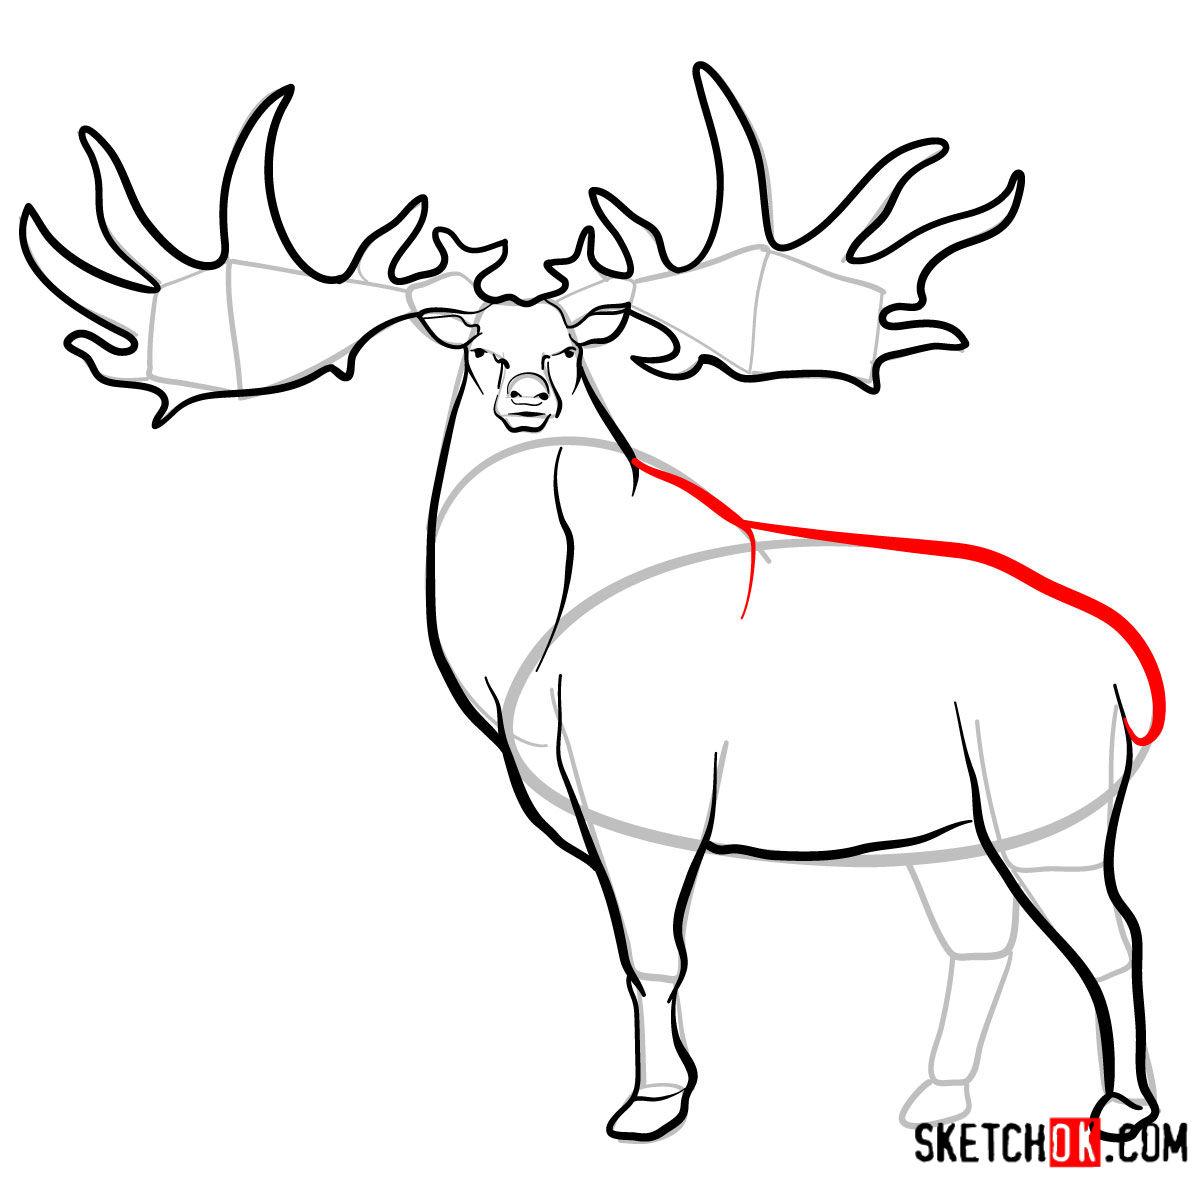 How to draw an Irish elk | Extinct Animals - step 10